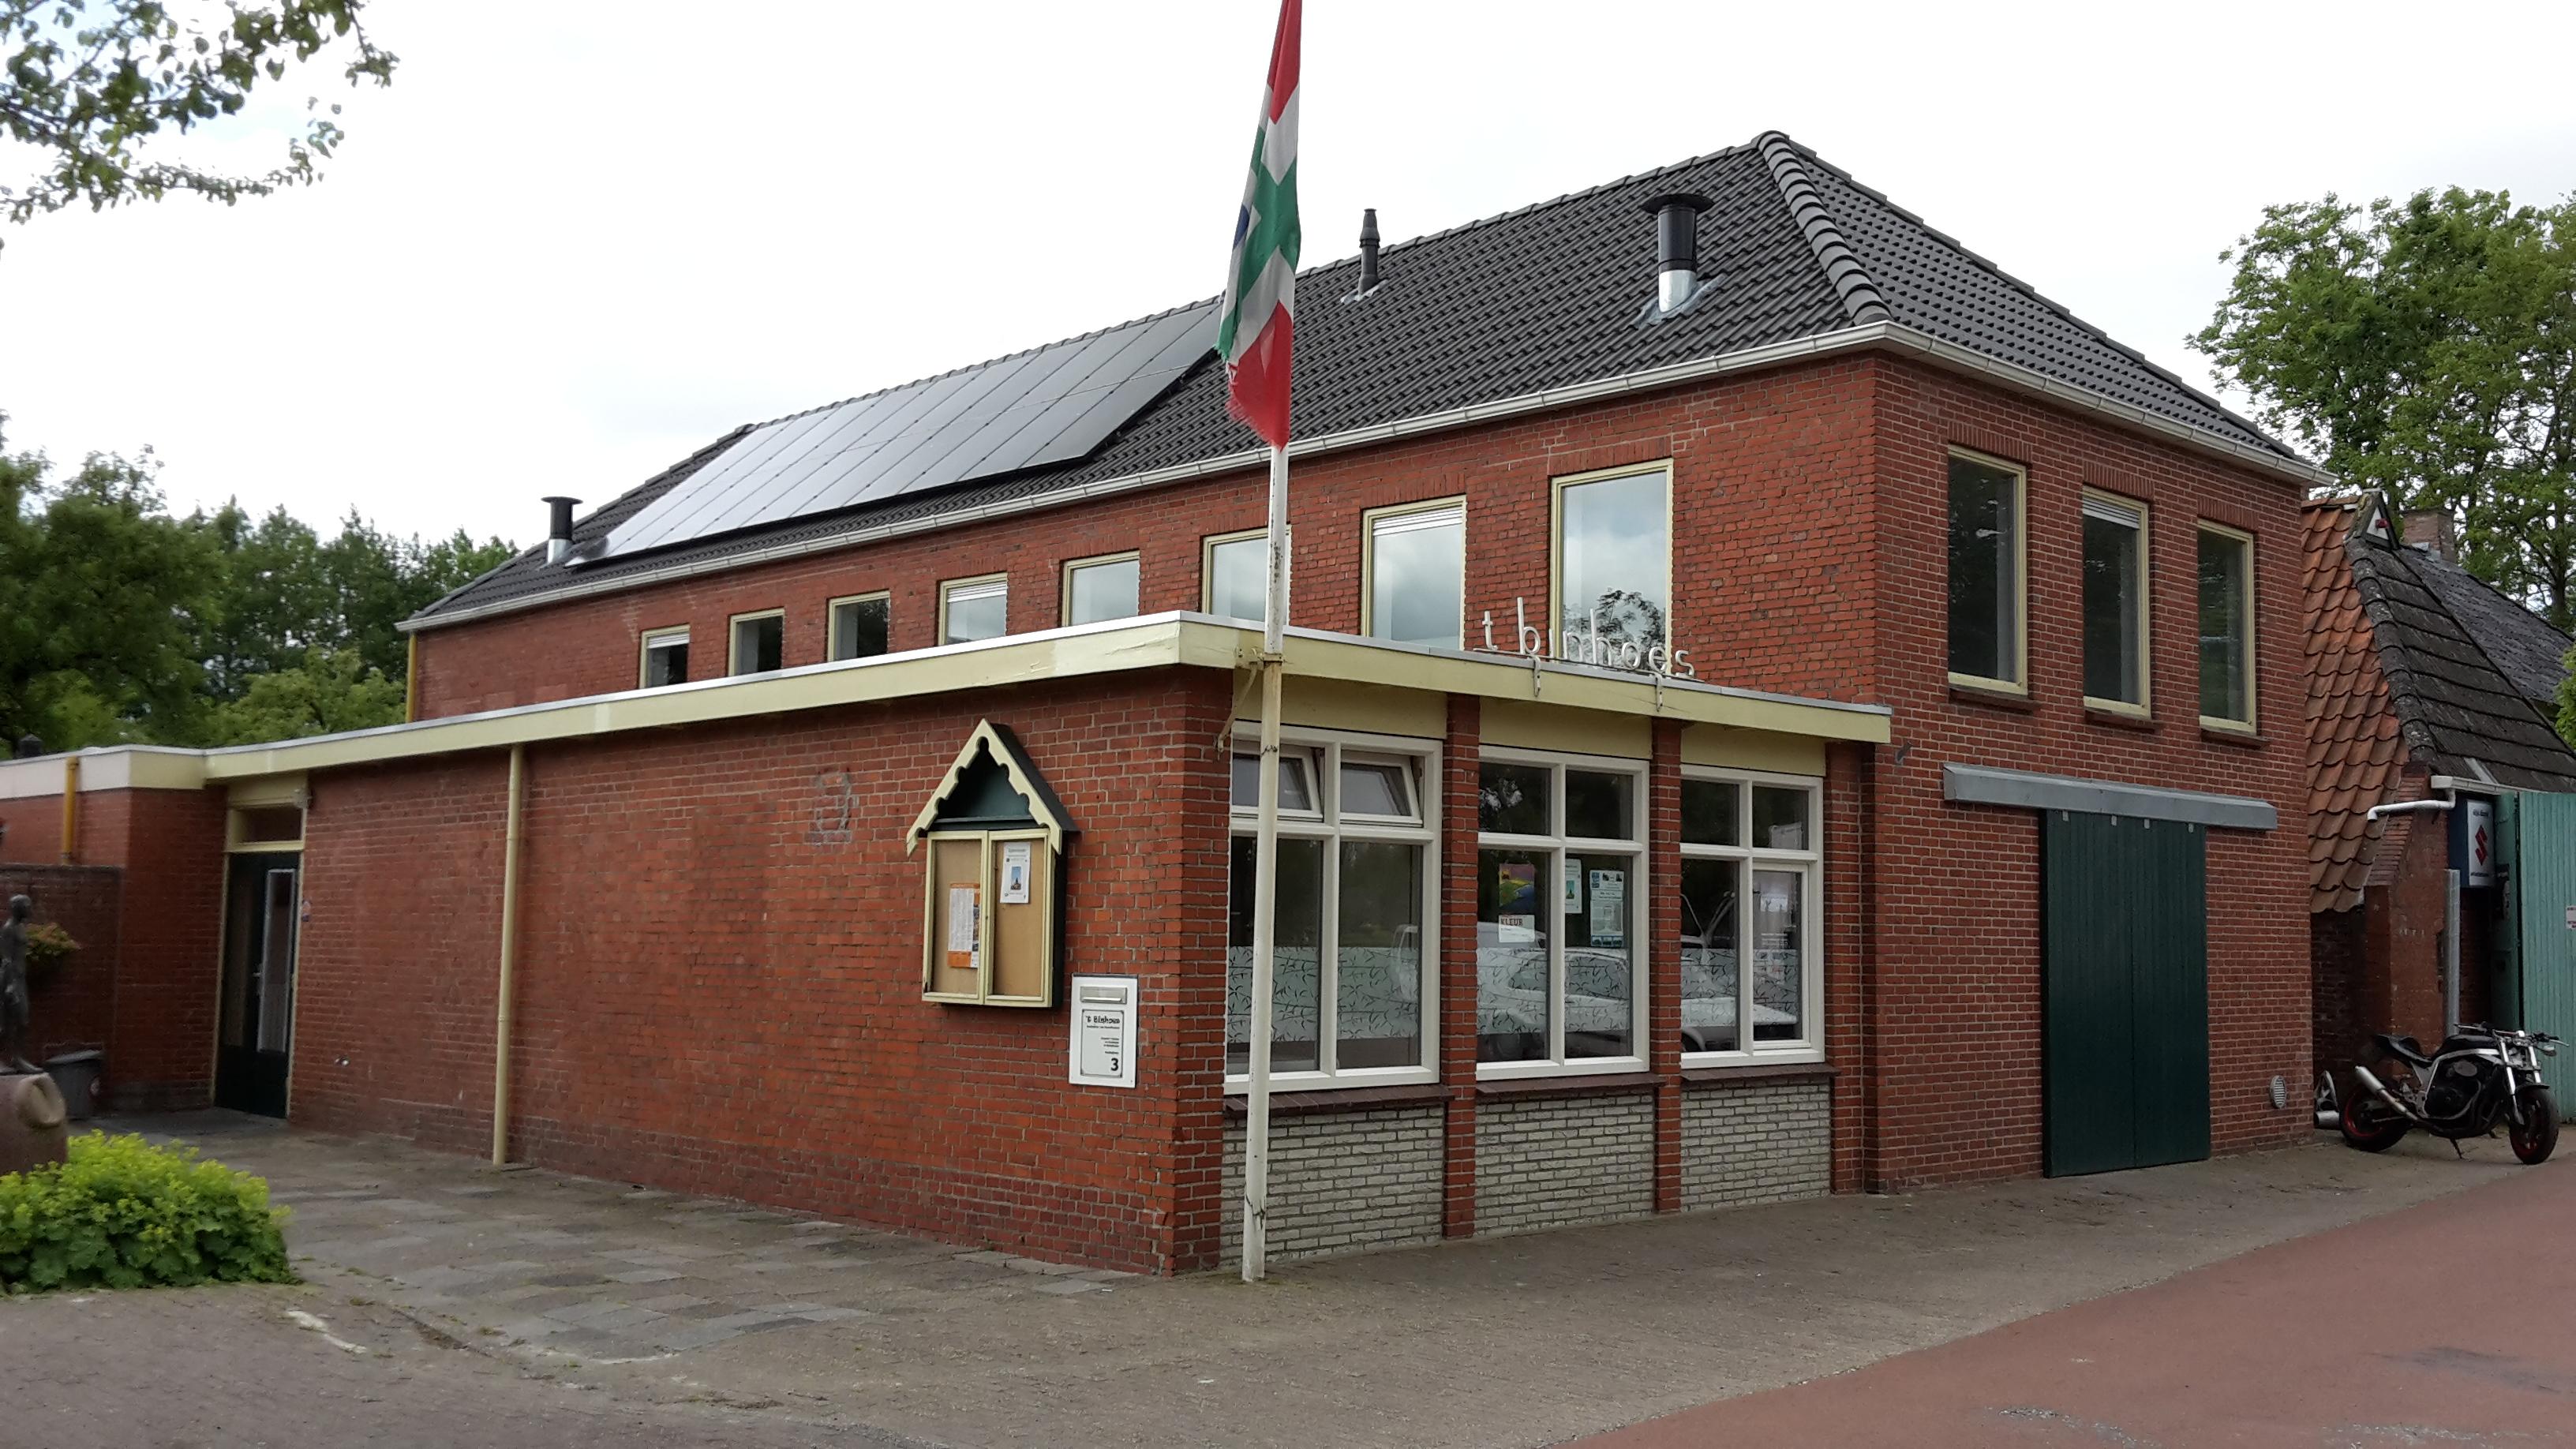 Binhoes Garsthuizen